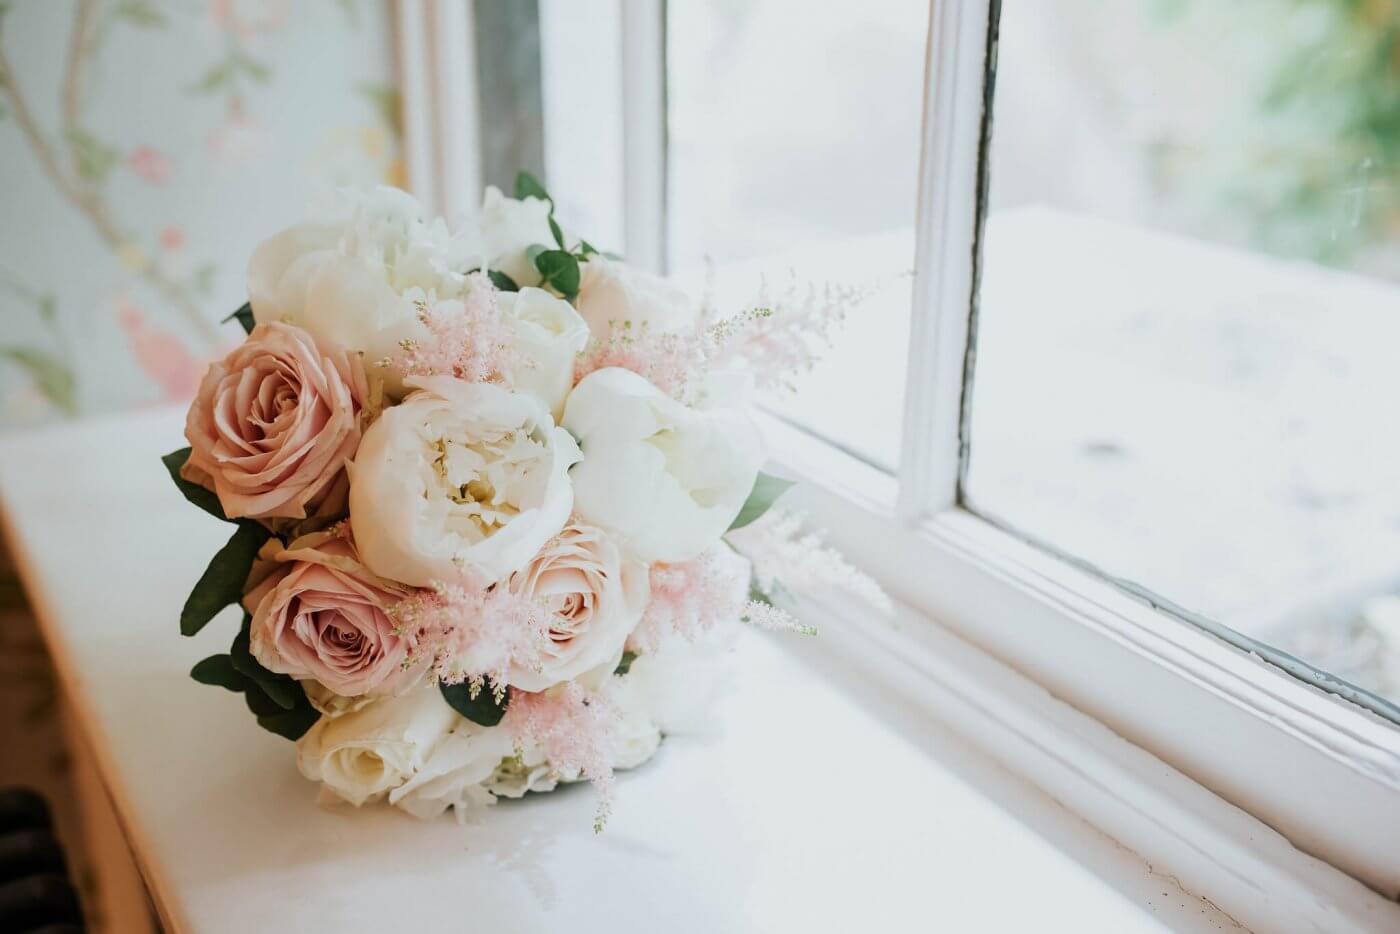 Flower on Window Ledge | The Mustcard